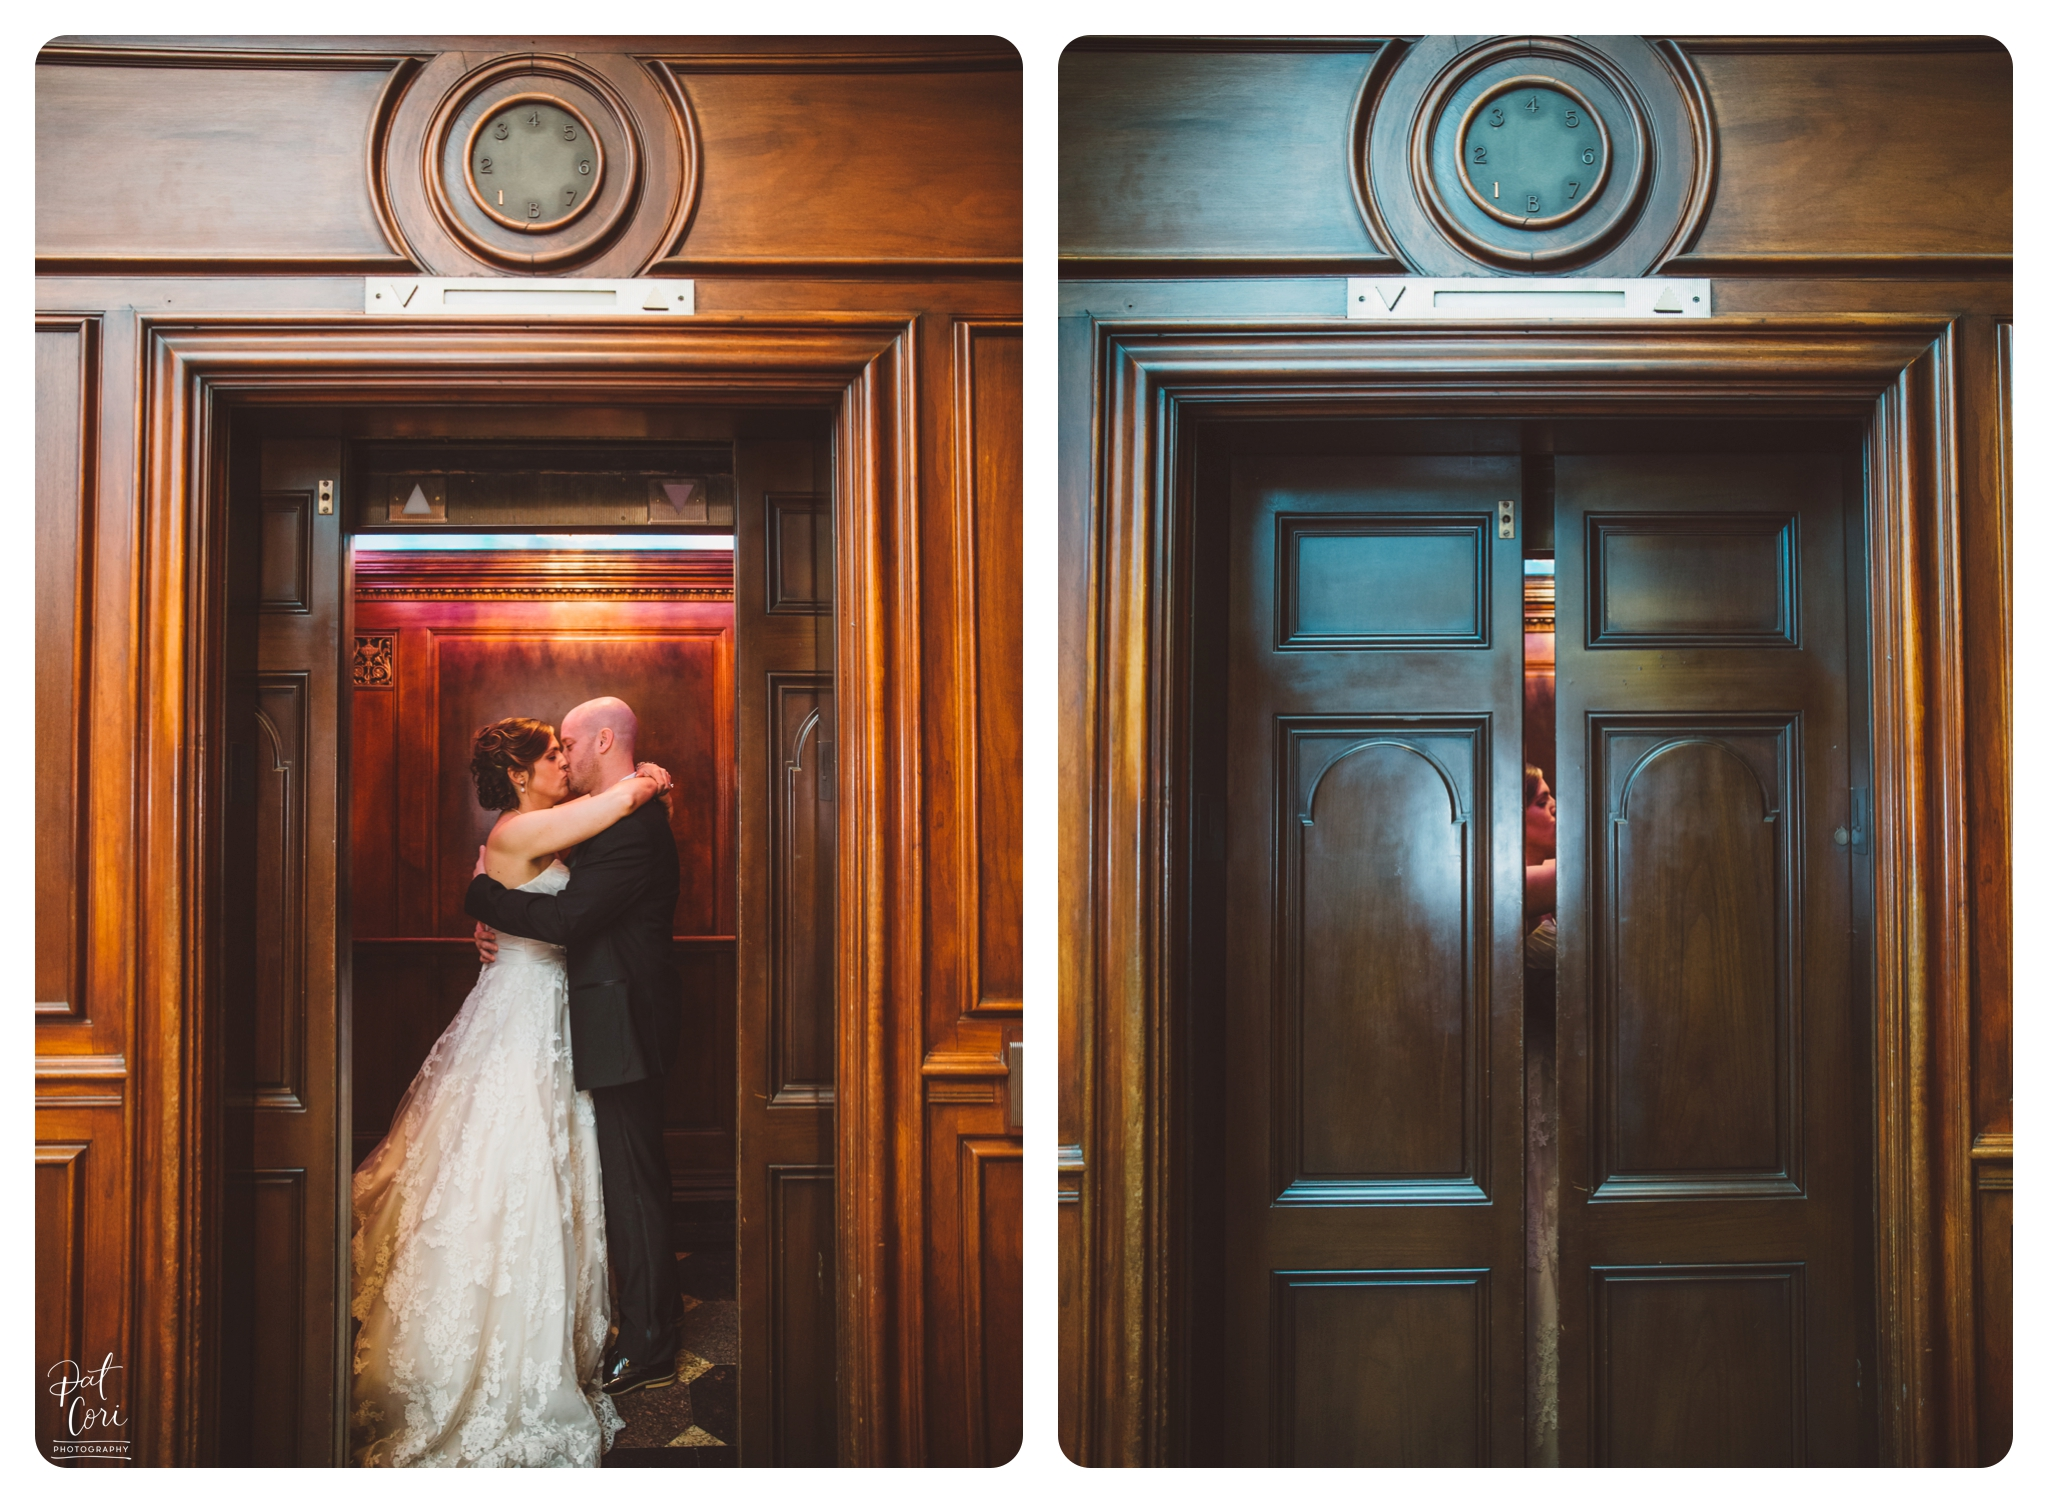 Center-in-the-Square-_-Weddings-Wedding-Photographer-Virginia-051.jpg